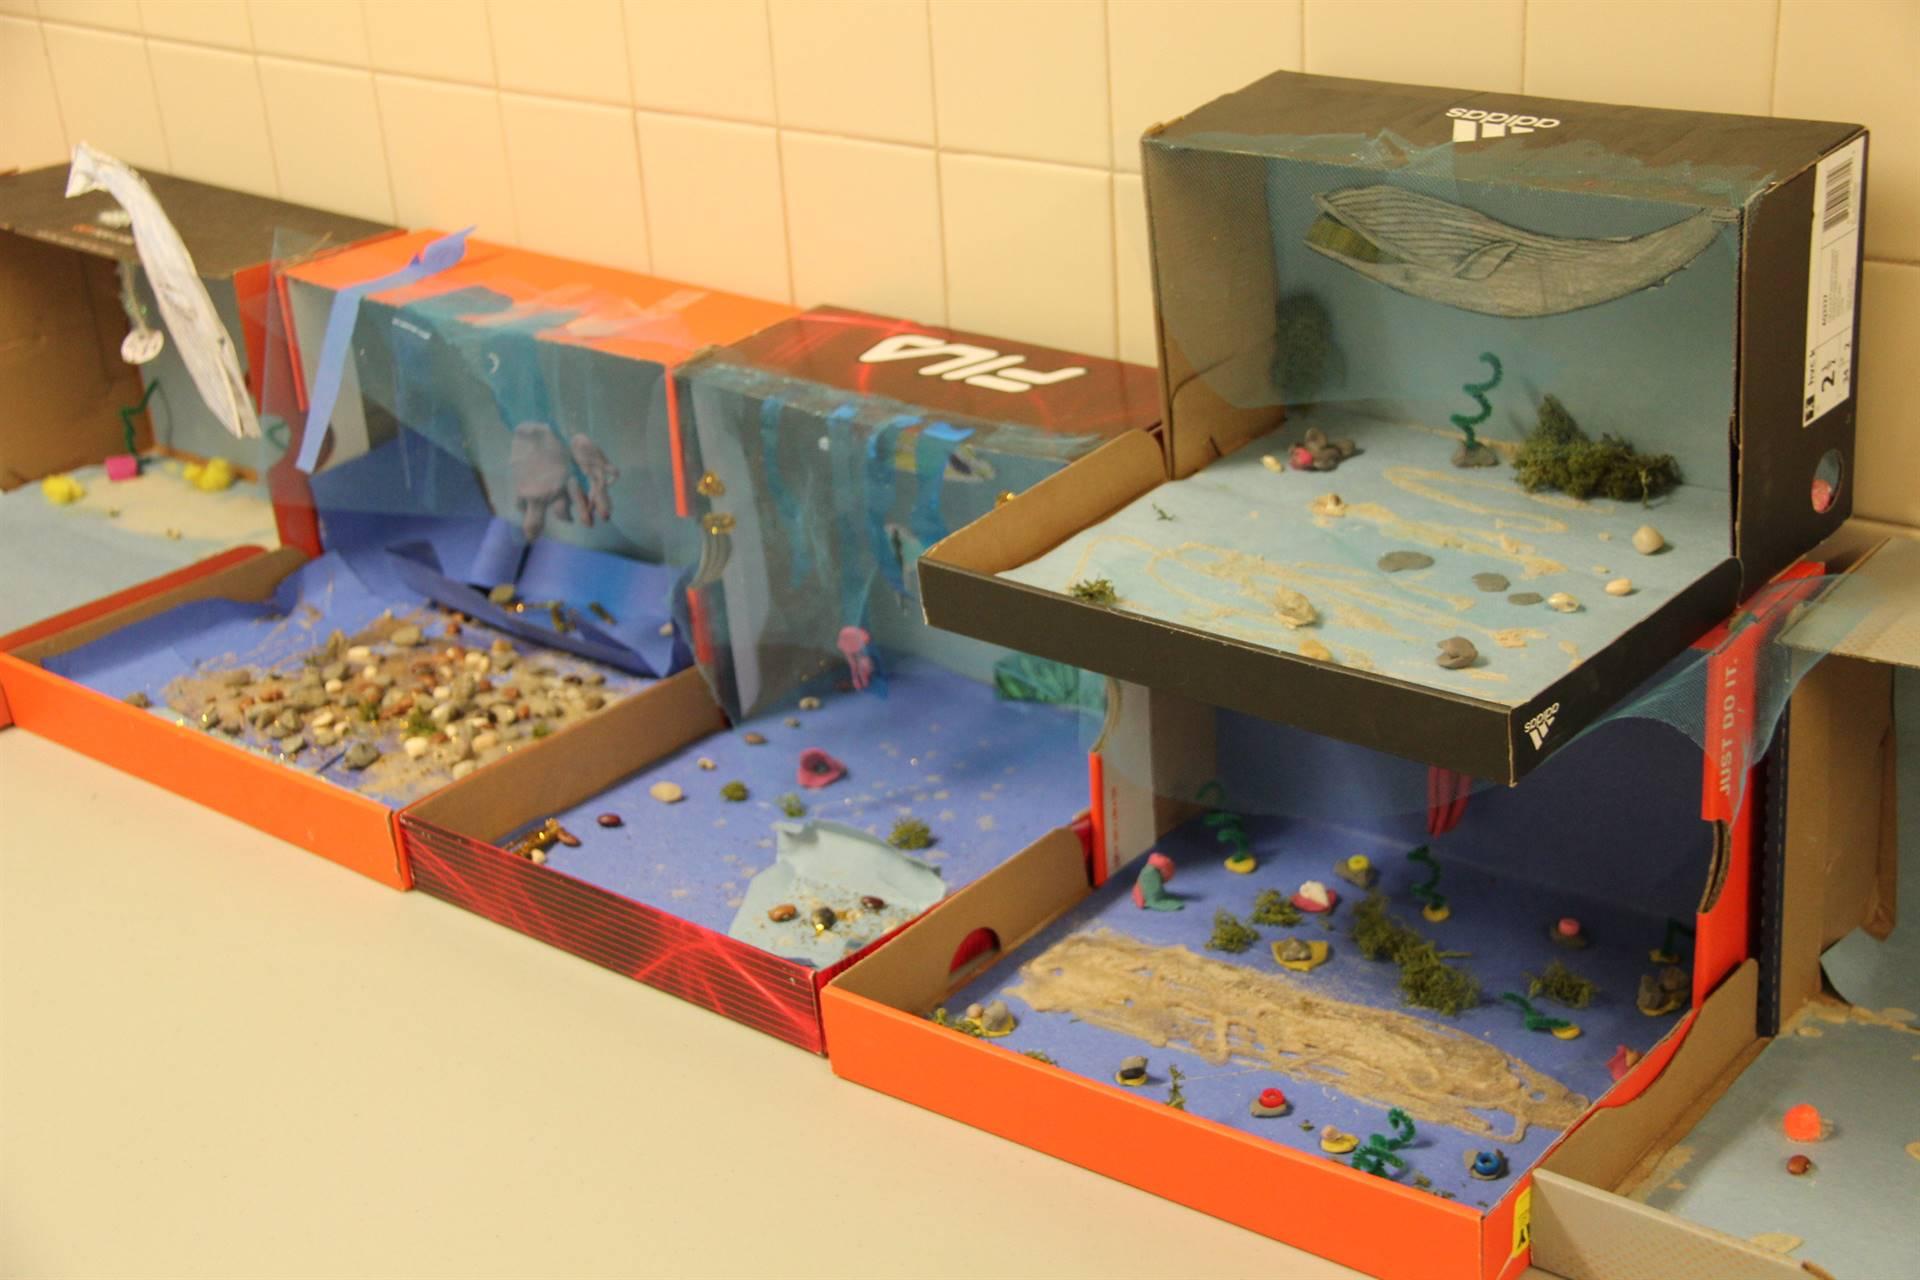 completed ocean habitat shoeboxes